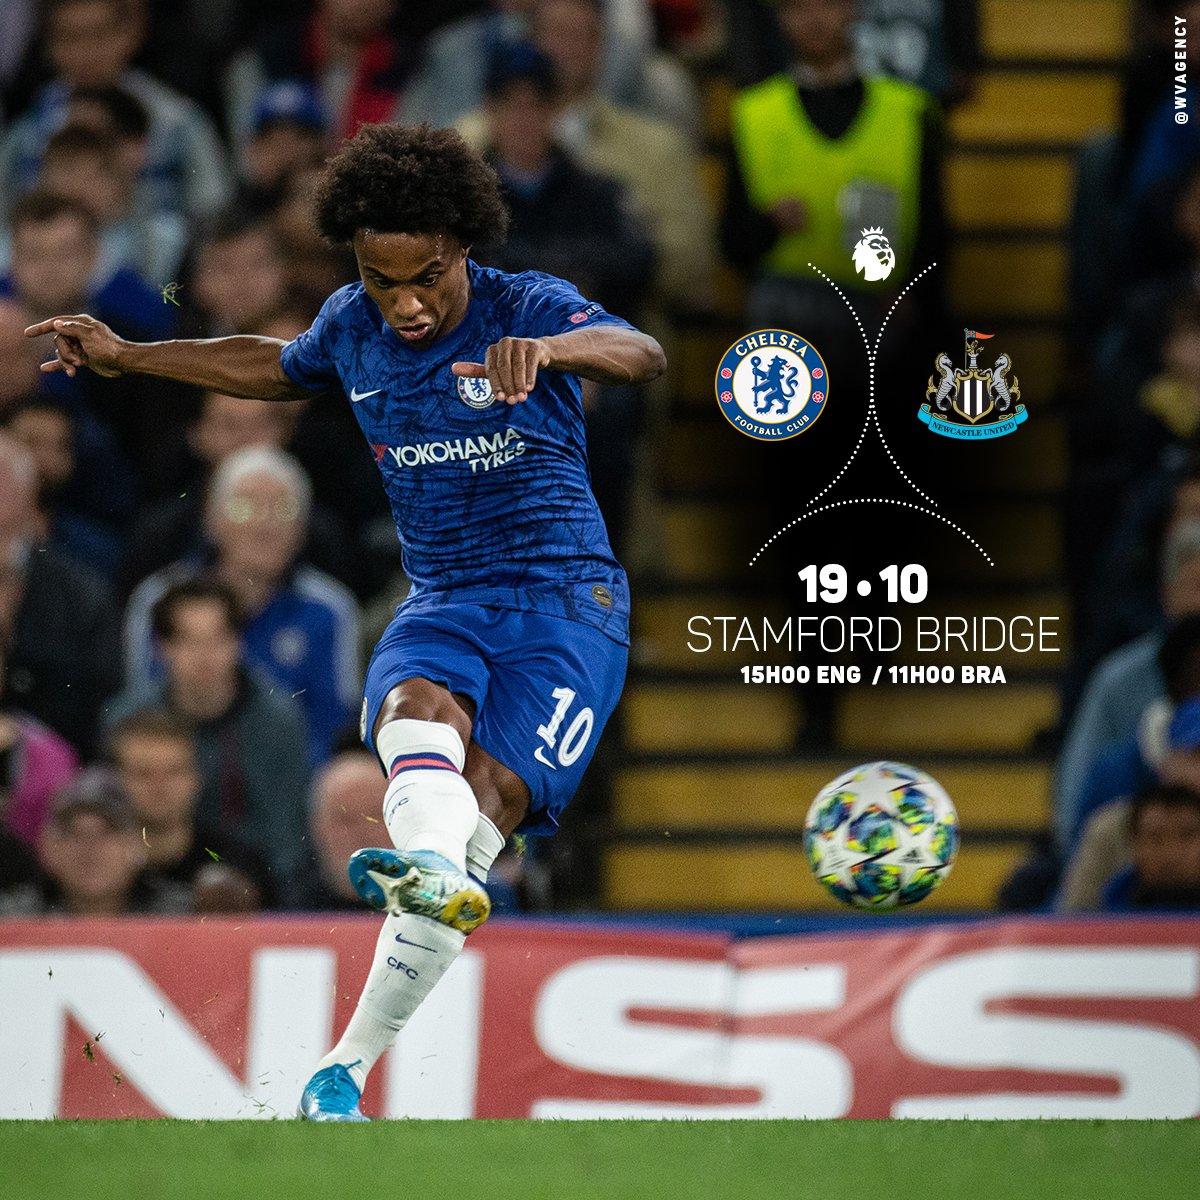 Matchday at the Bridge! Come on Chelsea!!! 💪🏿⚽️💙#CFC #premierleague #matchday #stamfordbridge #comeonchelsea #W10